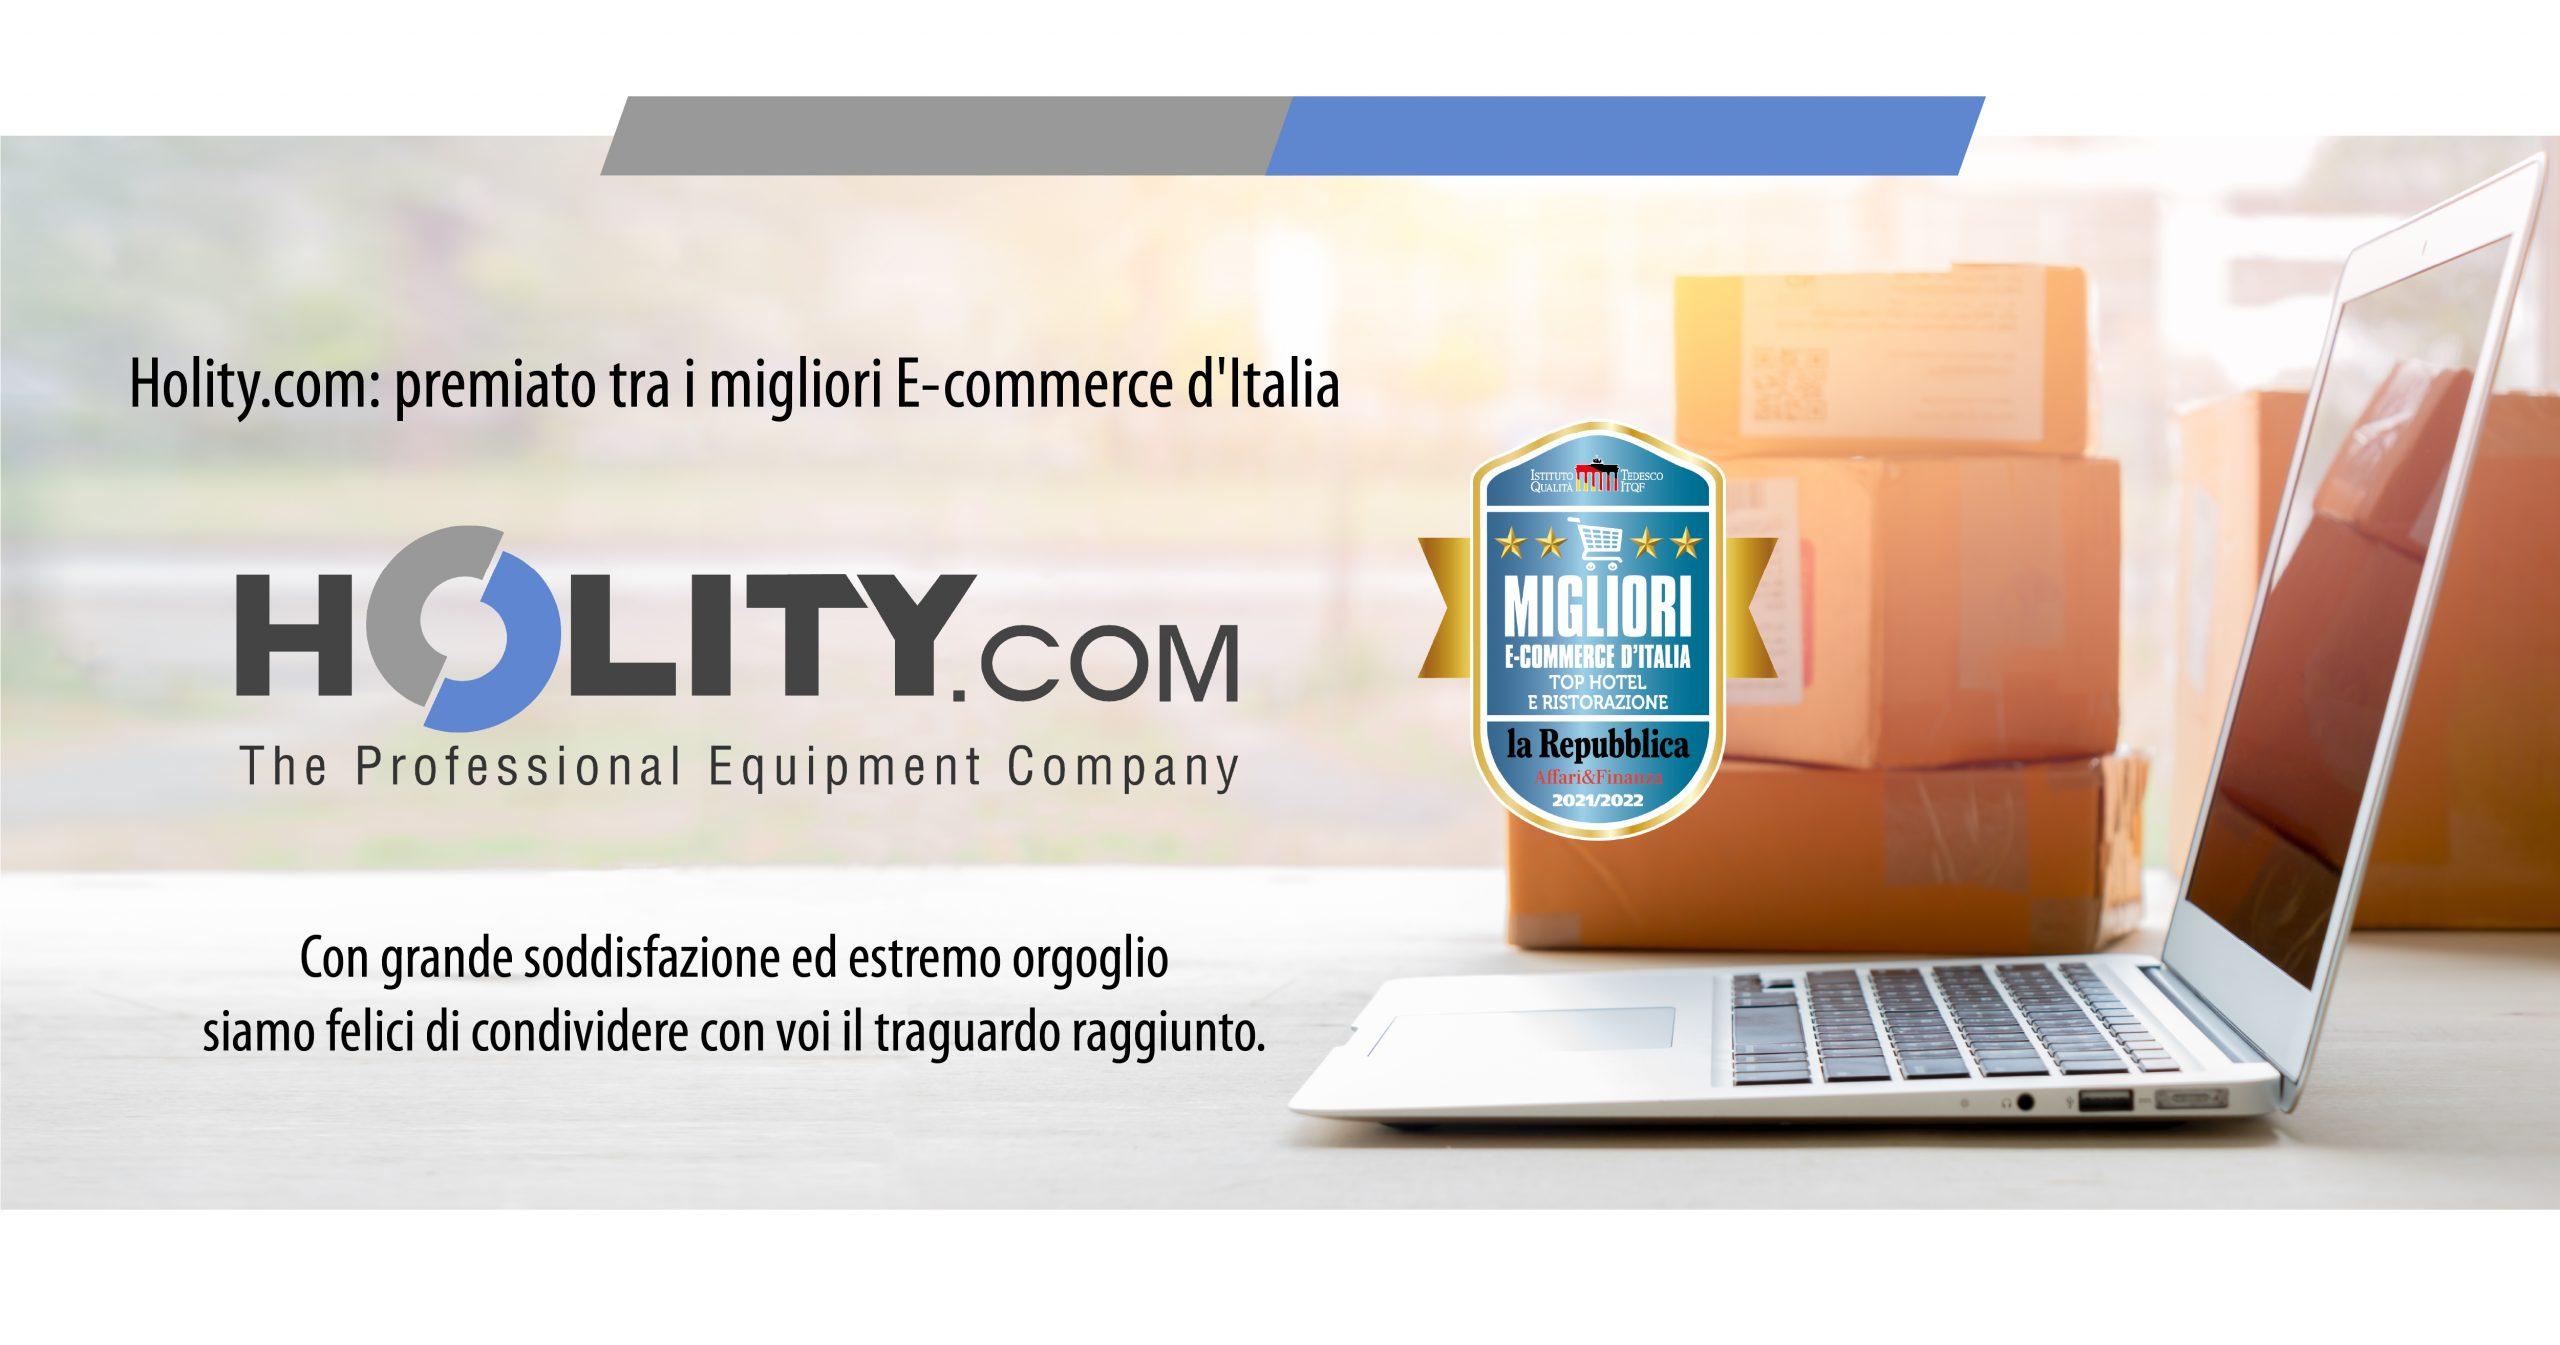 Holity.com tra i Migliori E-Commerce d'Italia